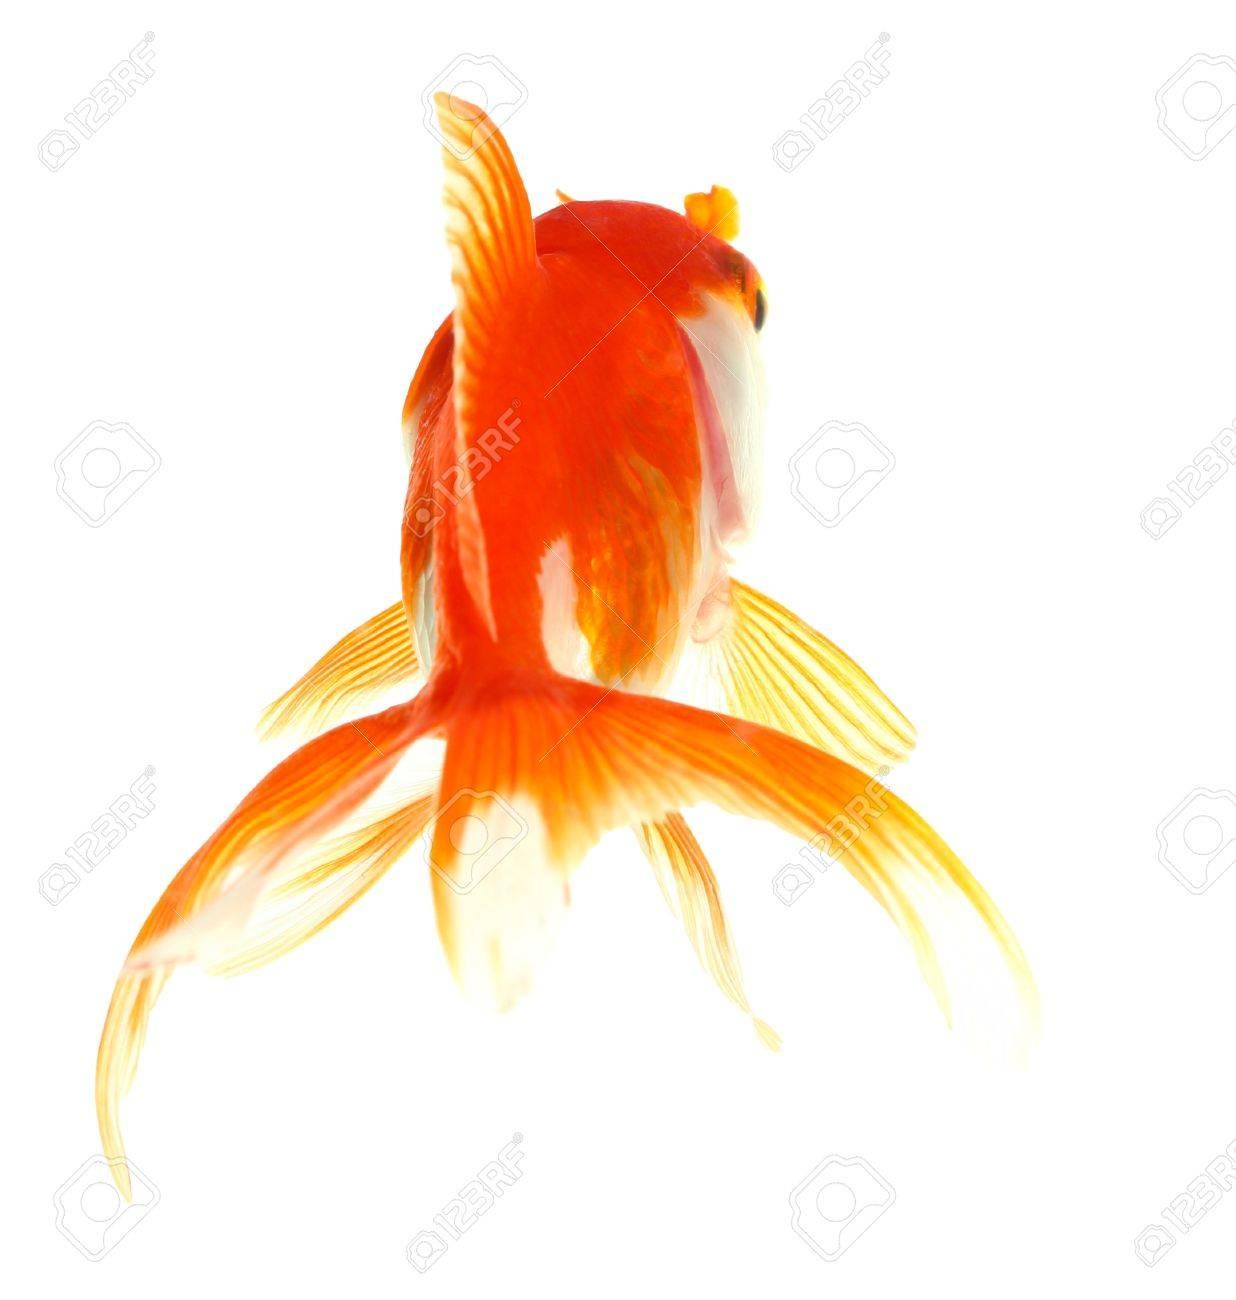 Gold fish  Isolation  on the white Stock Photo - 17422029